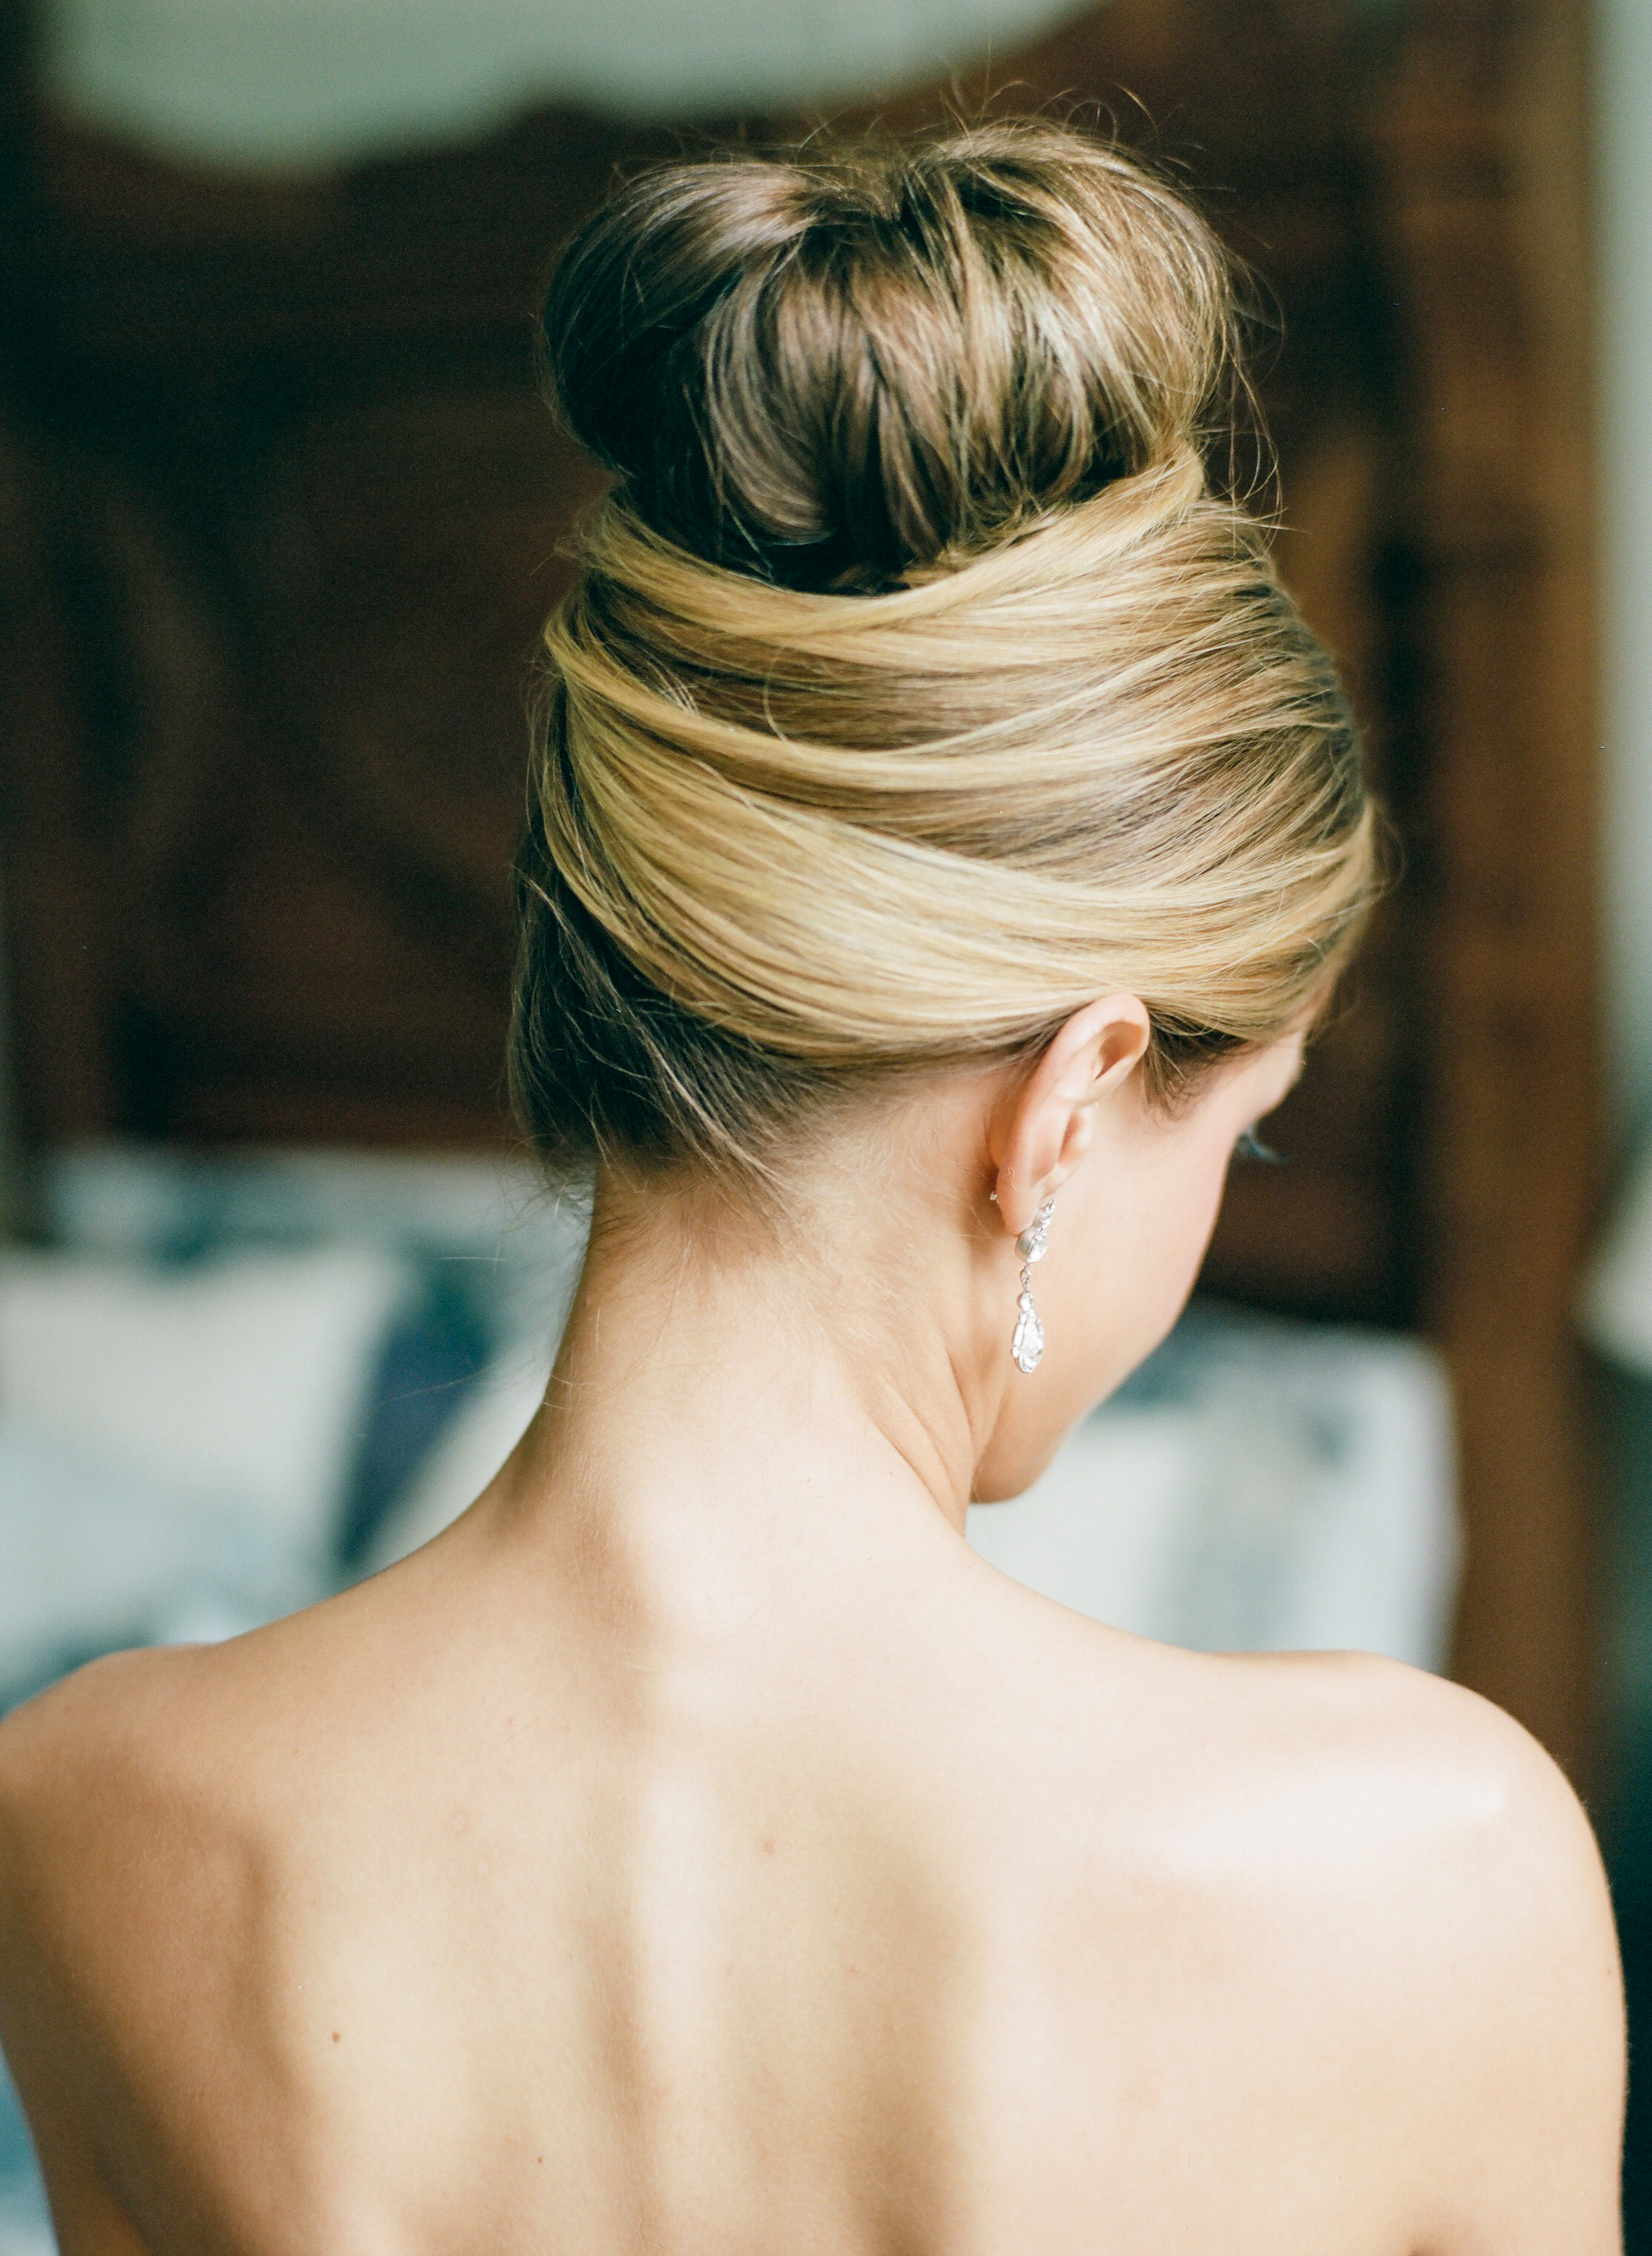 Dana-Fernandez-Photography-Houston-Wedding-Photographer-Style-Me-Pretty-Film-Texas-Destination-Photographer-6.jpg